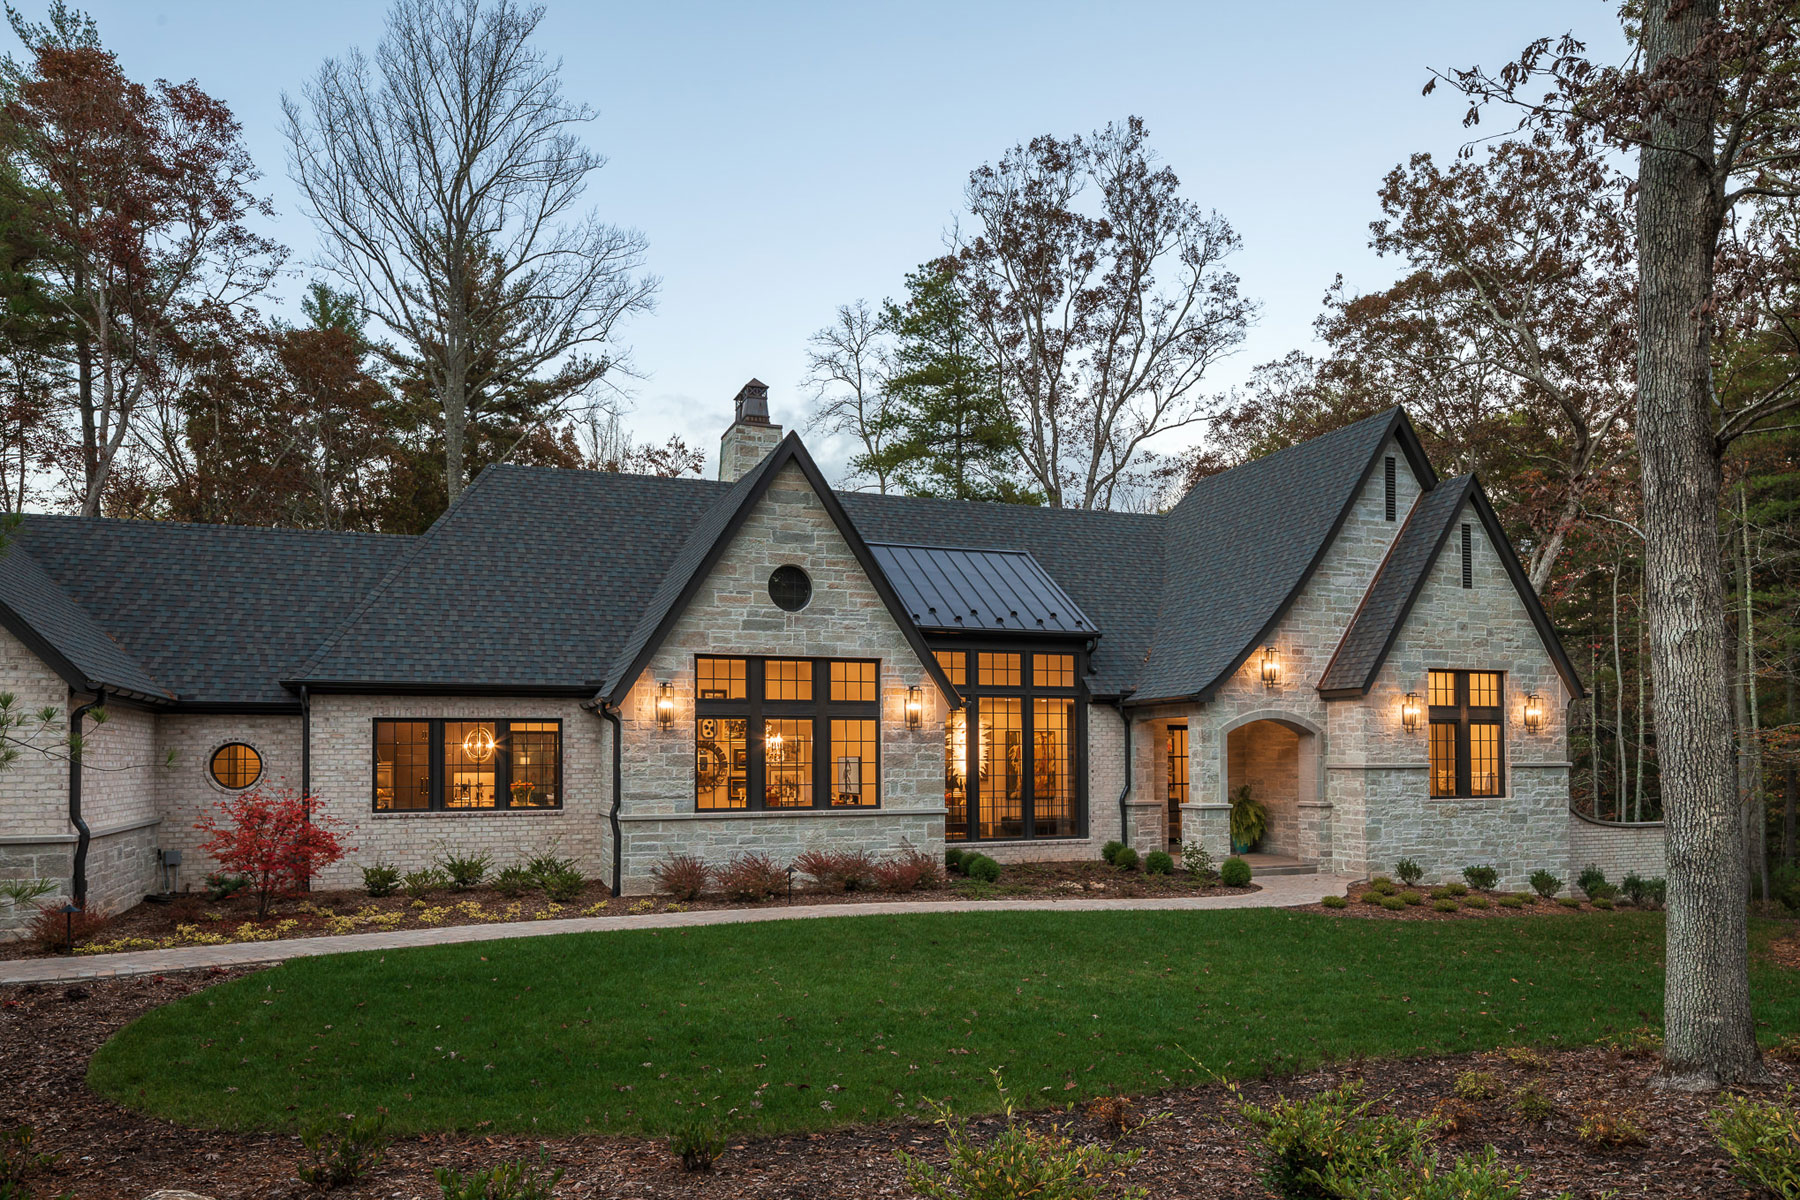 Front elevation of ACM Design architecture & interiors designed custom home